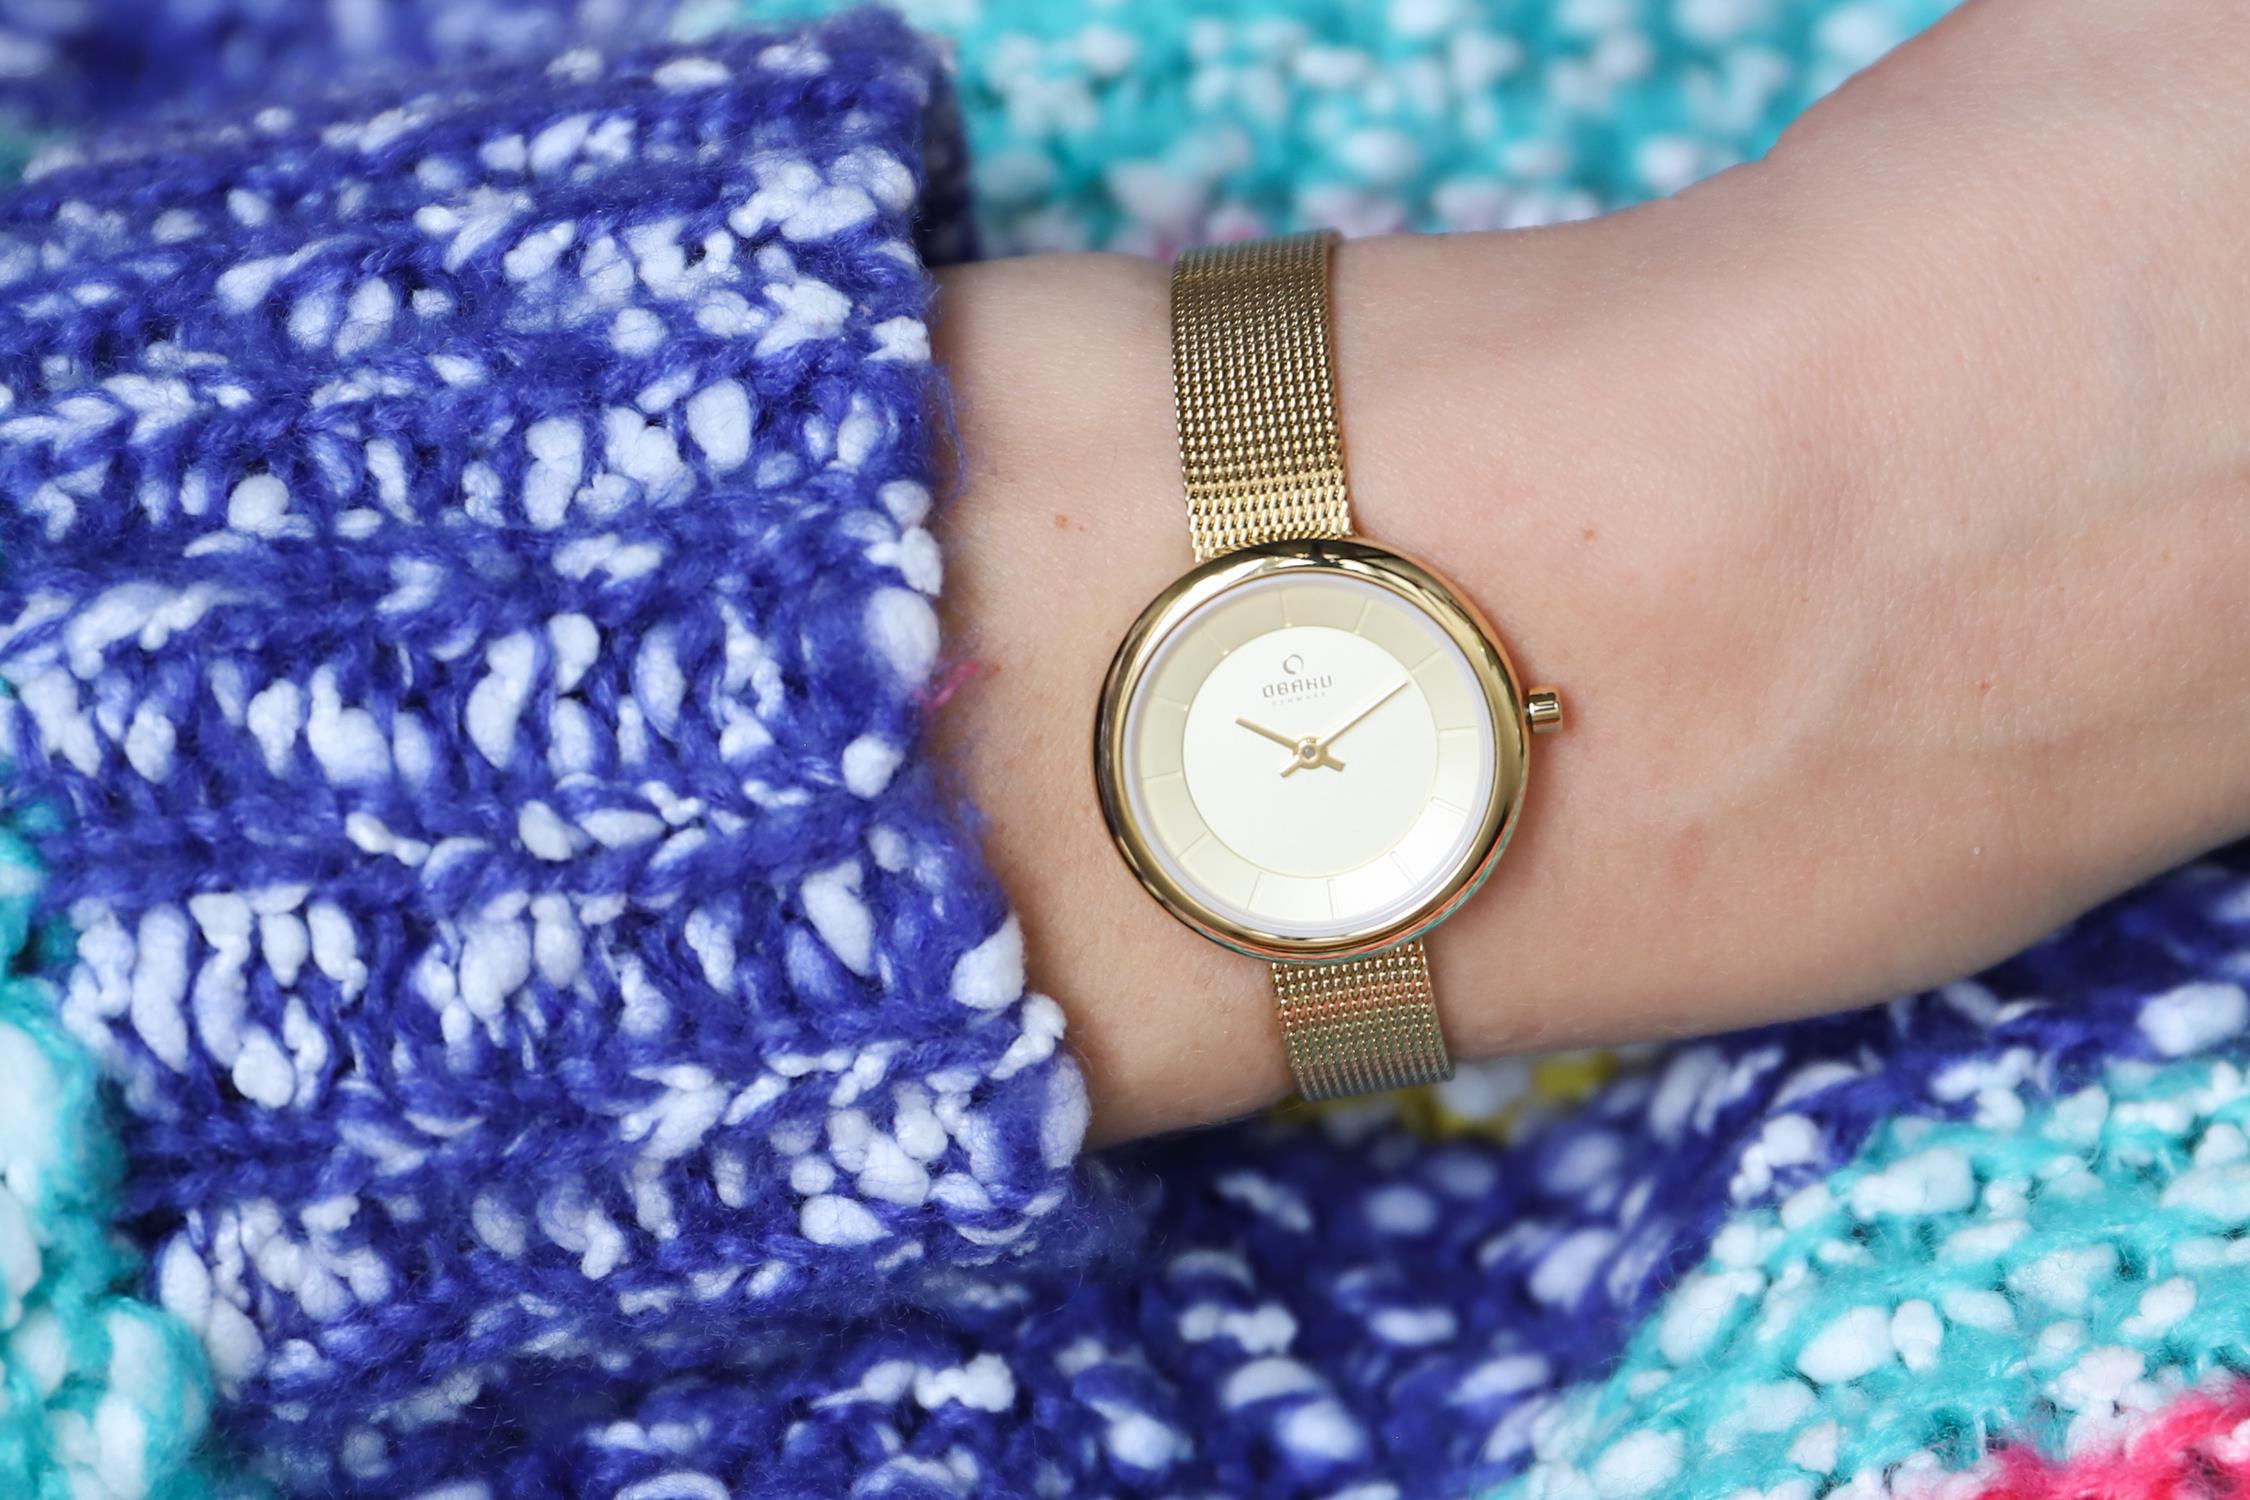 Obaku Denmark V146LGGMG zegarek złoty fashion/modowy Slim bransoleta